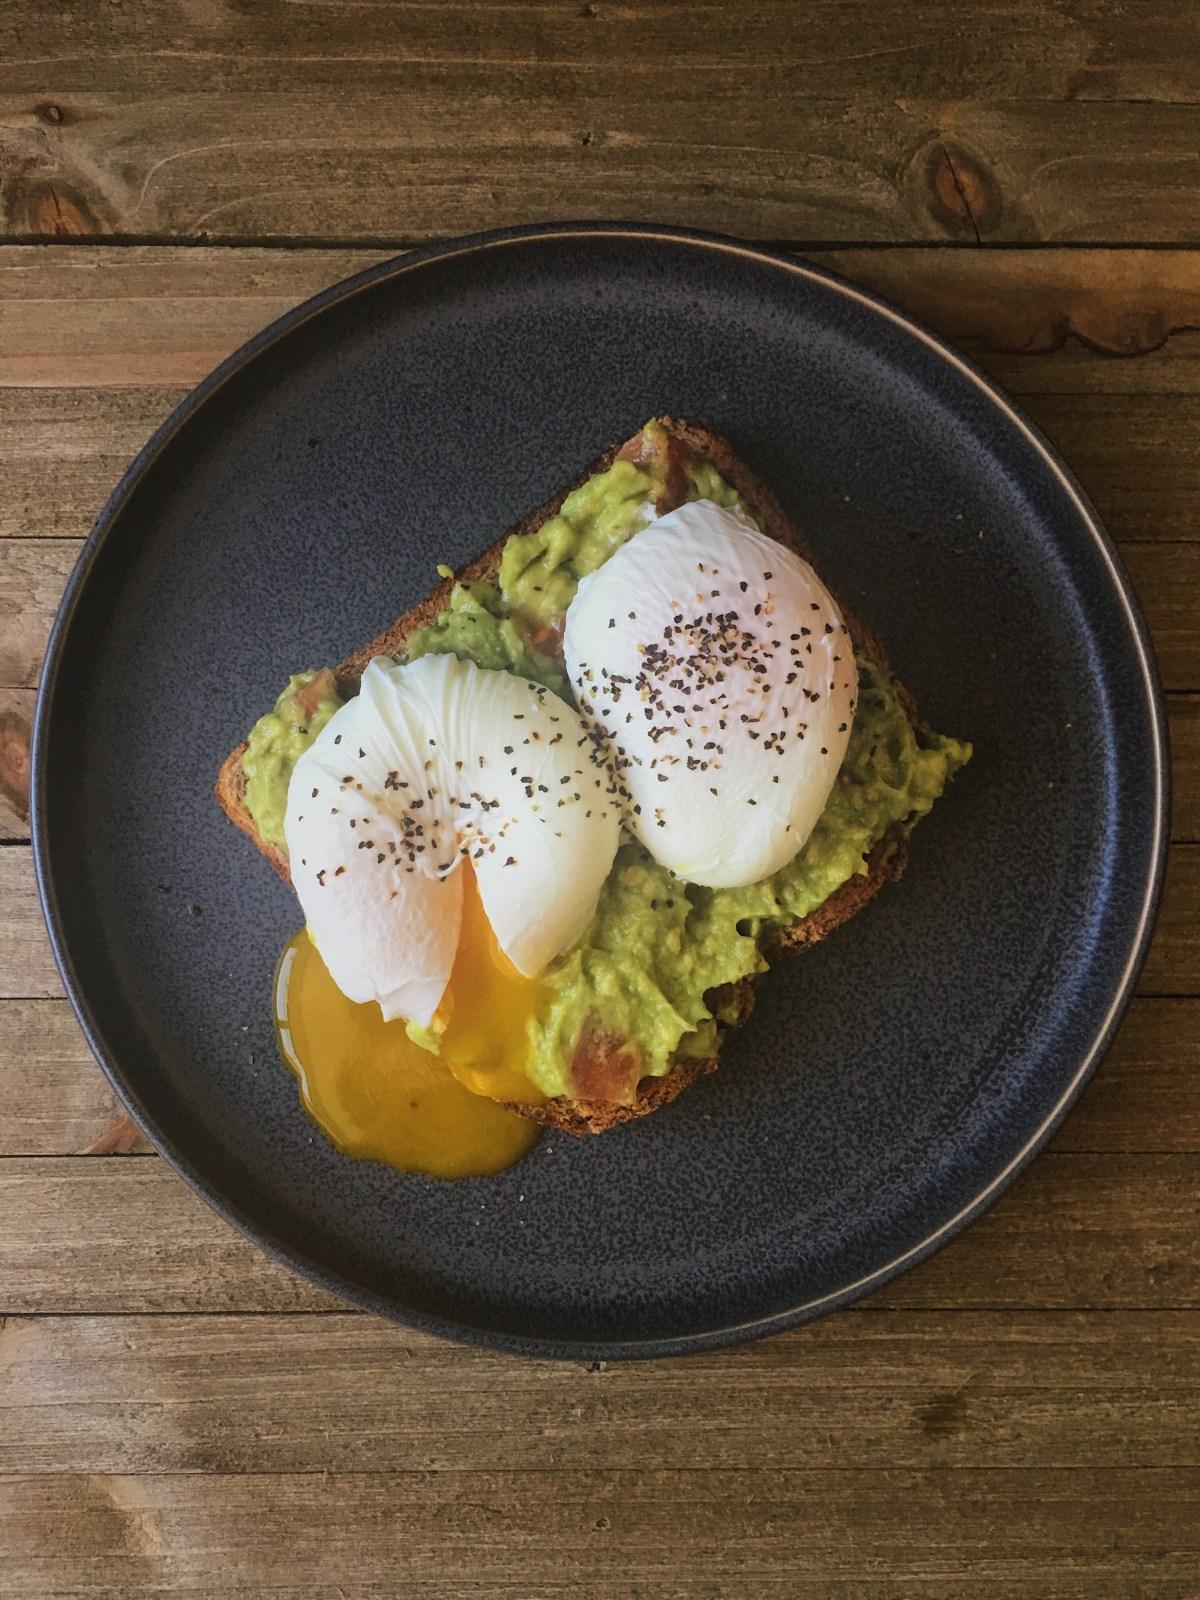 Beautifully poached egg on avocado toast